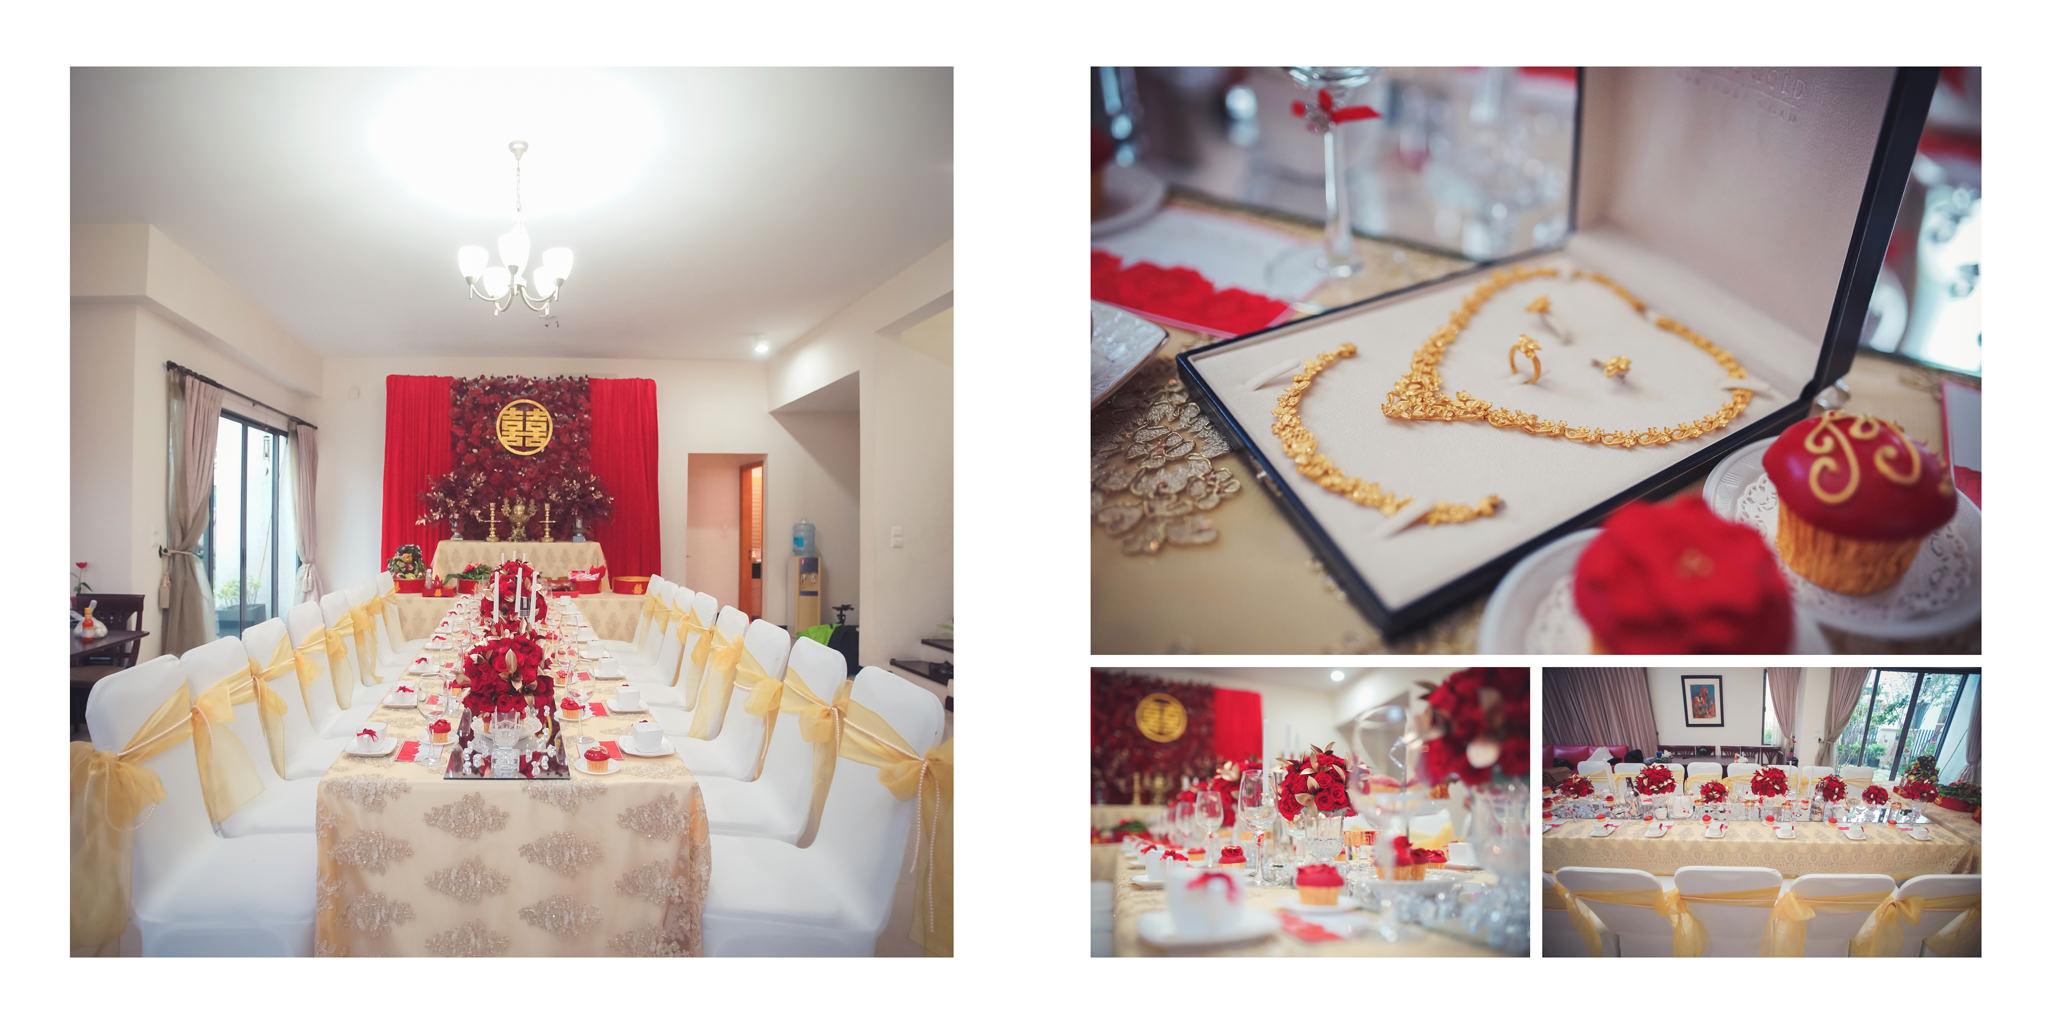 Ceremony_Thang_&_Phuong_02.jpg